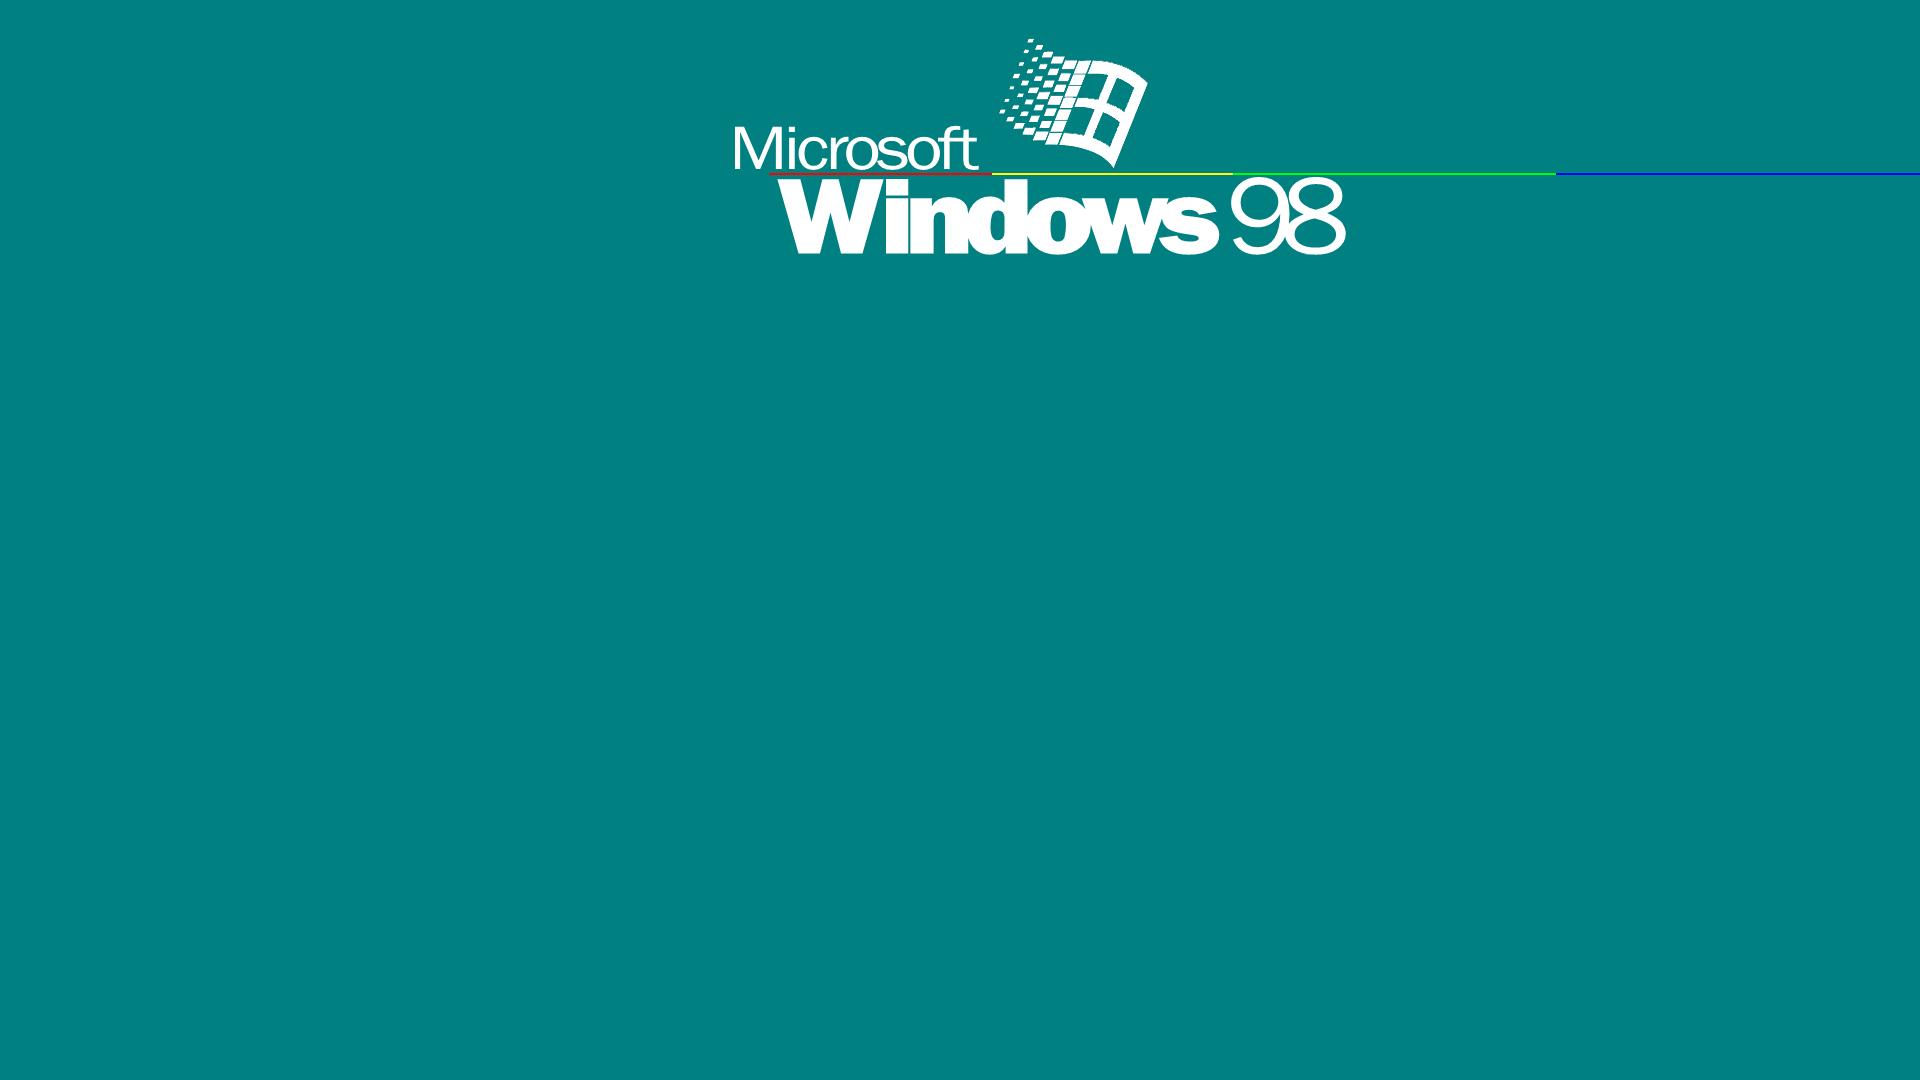 46 Windows 98 Desktop Wallpaper On Wallpapersafari